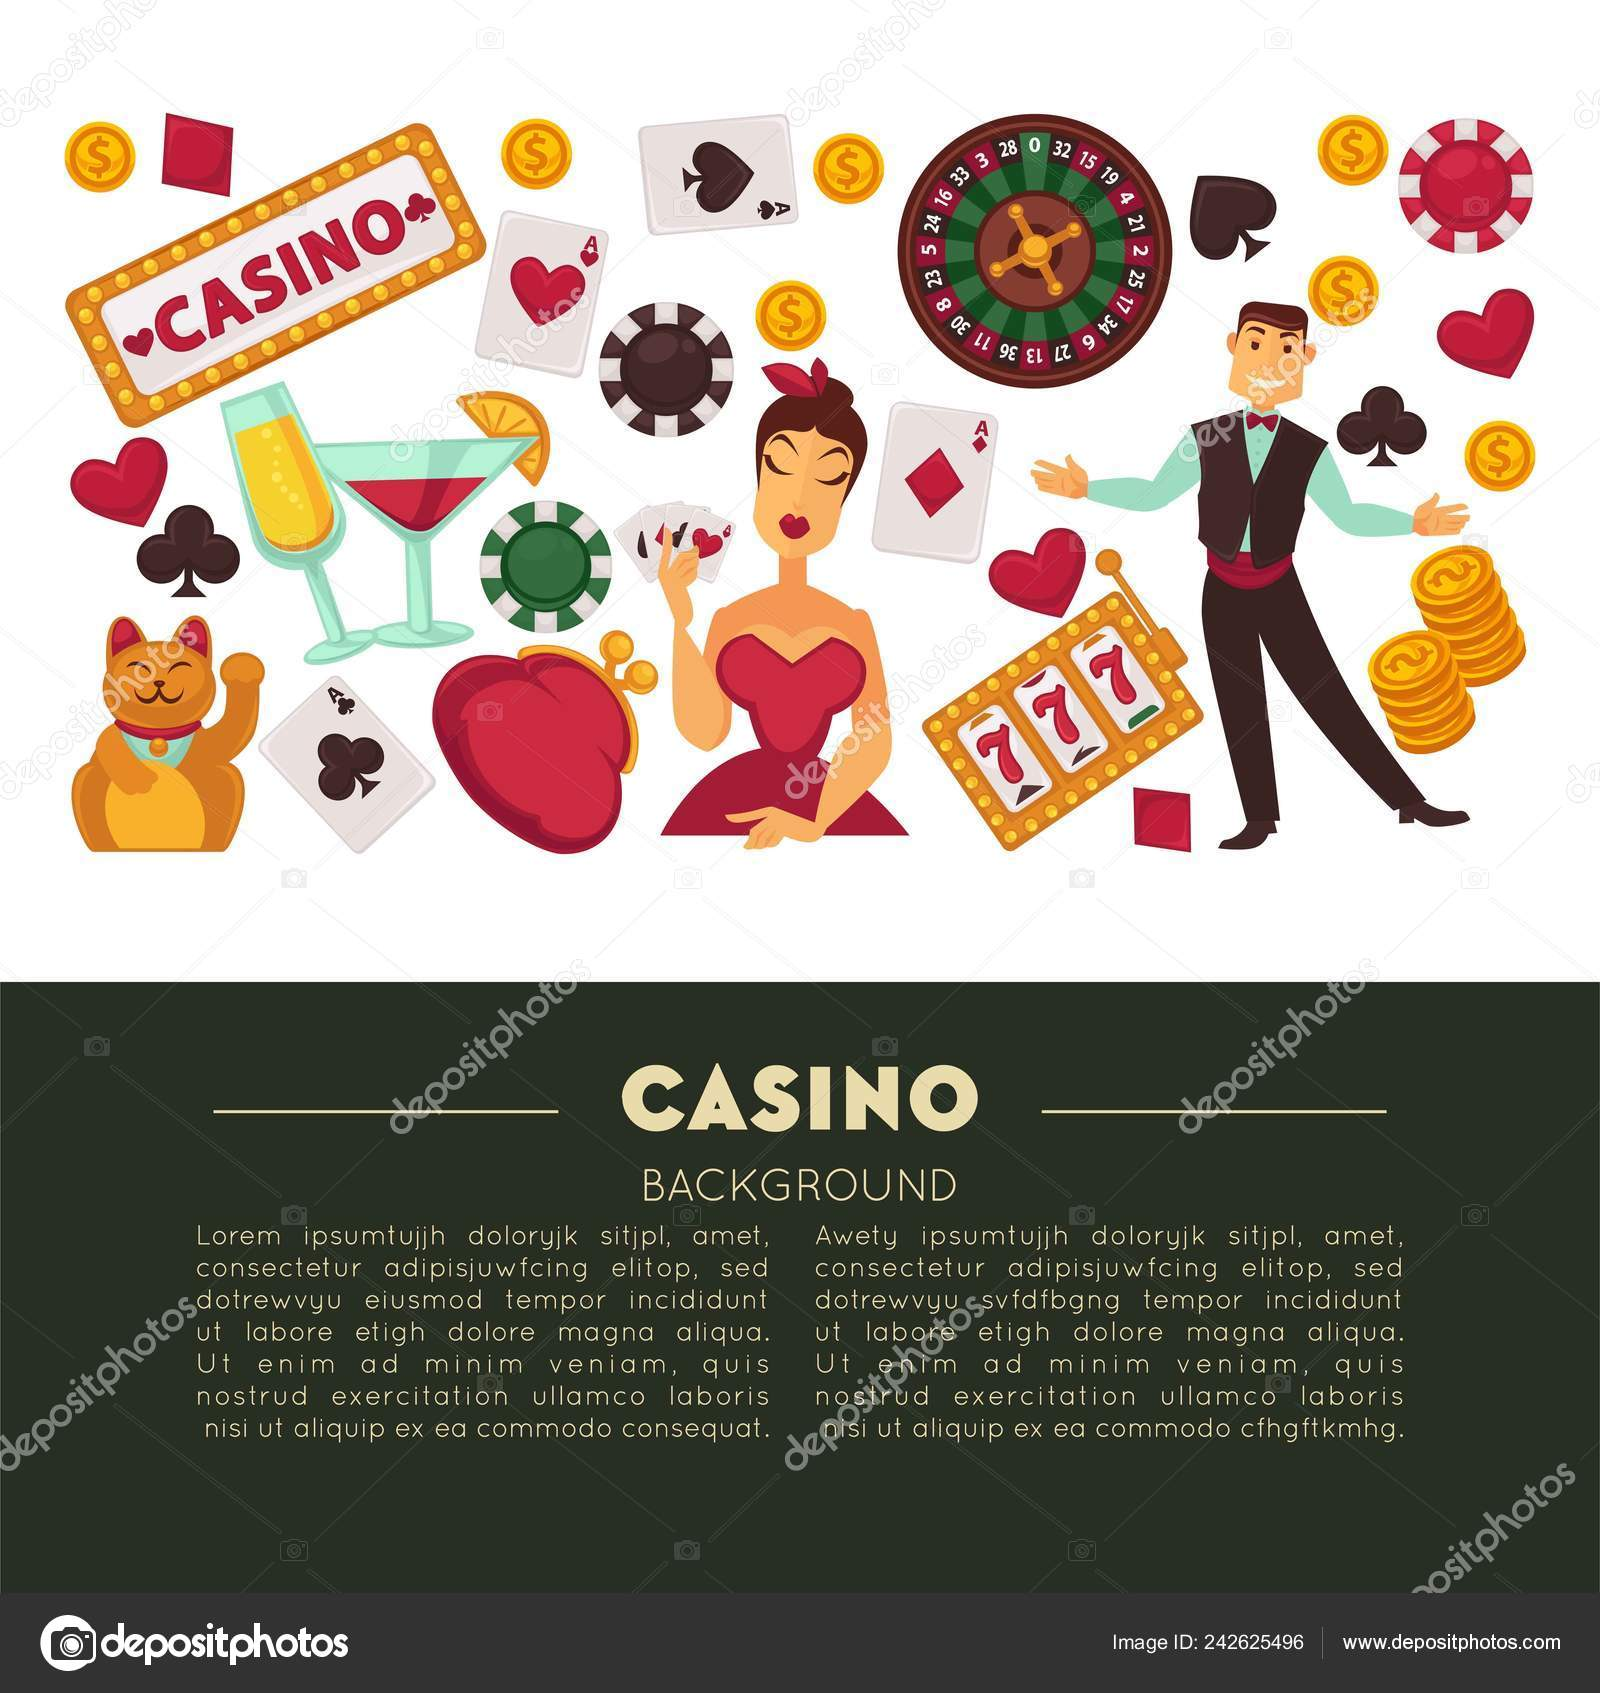 Мега джек покер